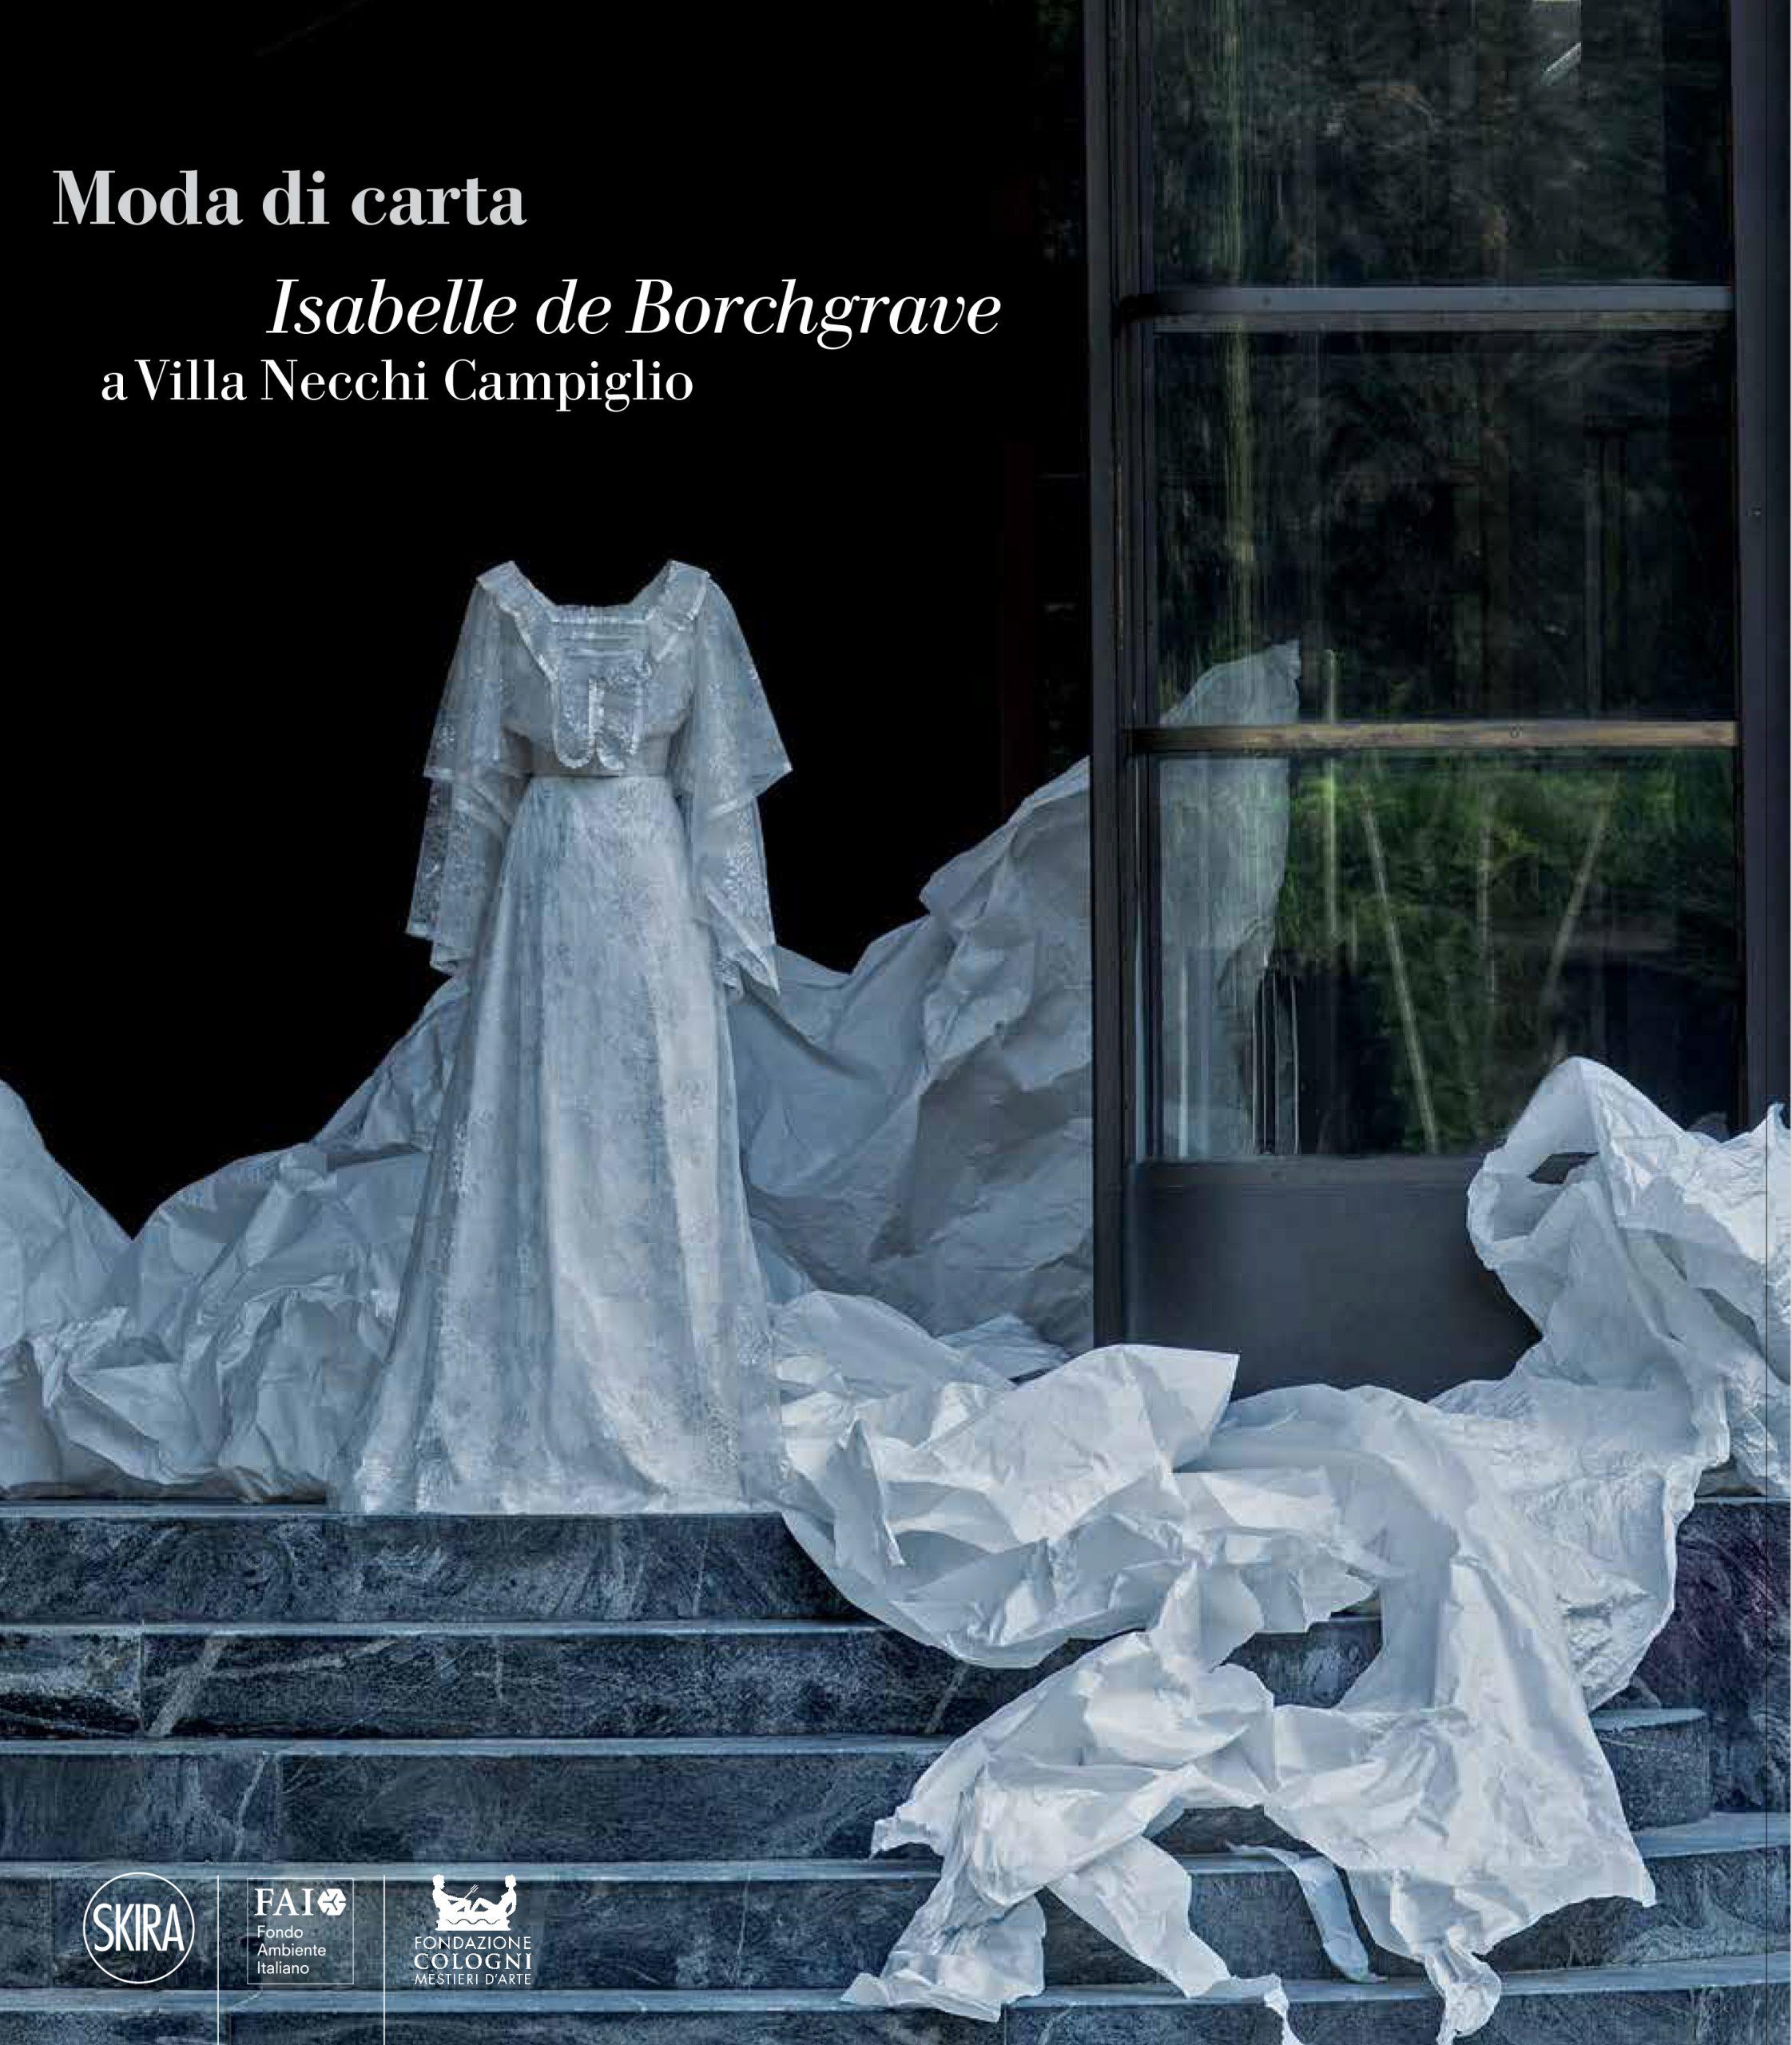 Guido Taroni: Moda di Carta